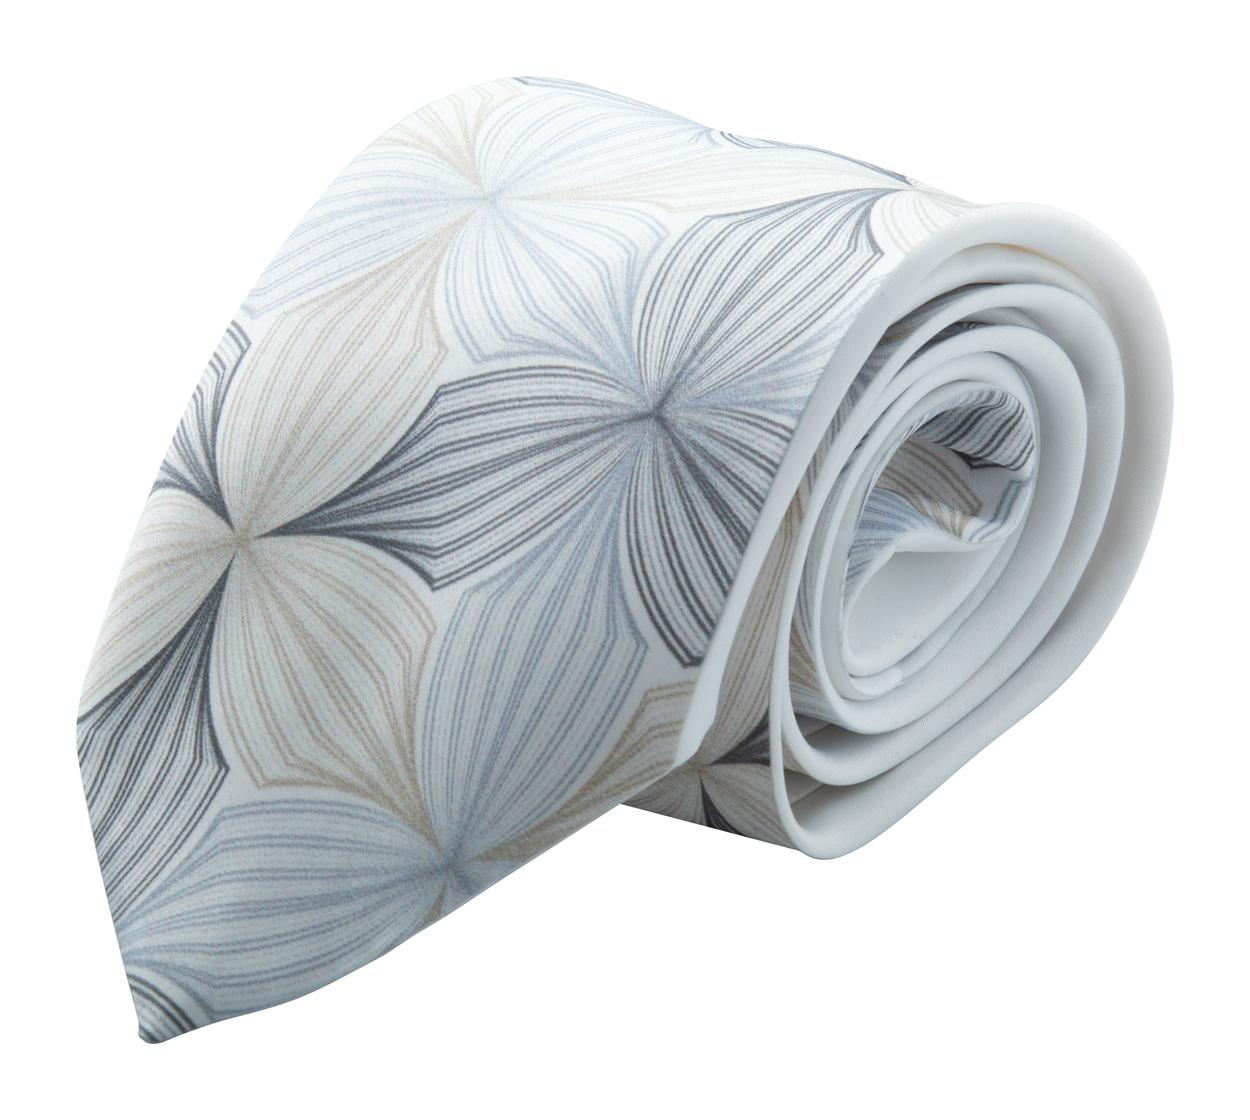 Suboknot sublimation necktie